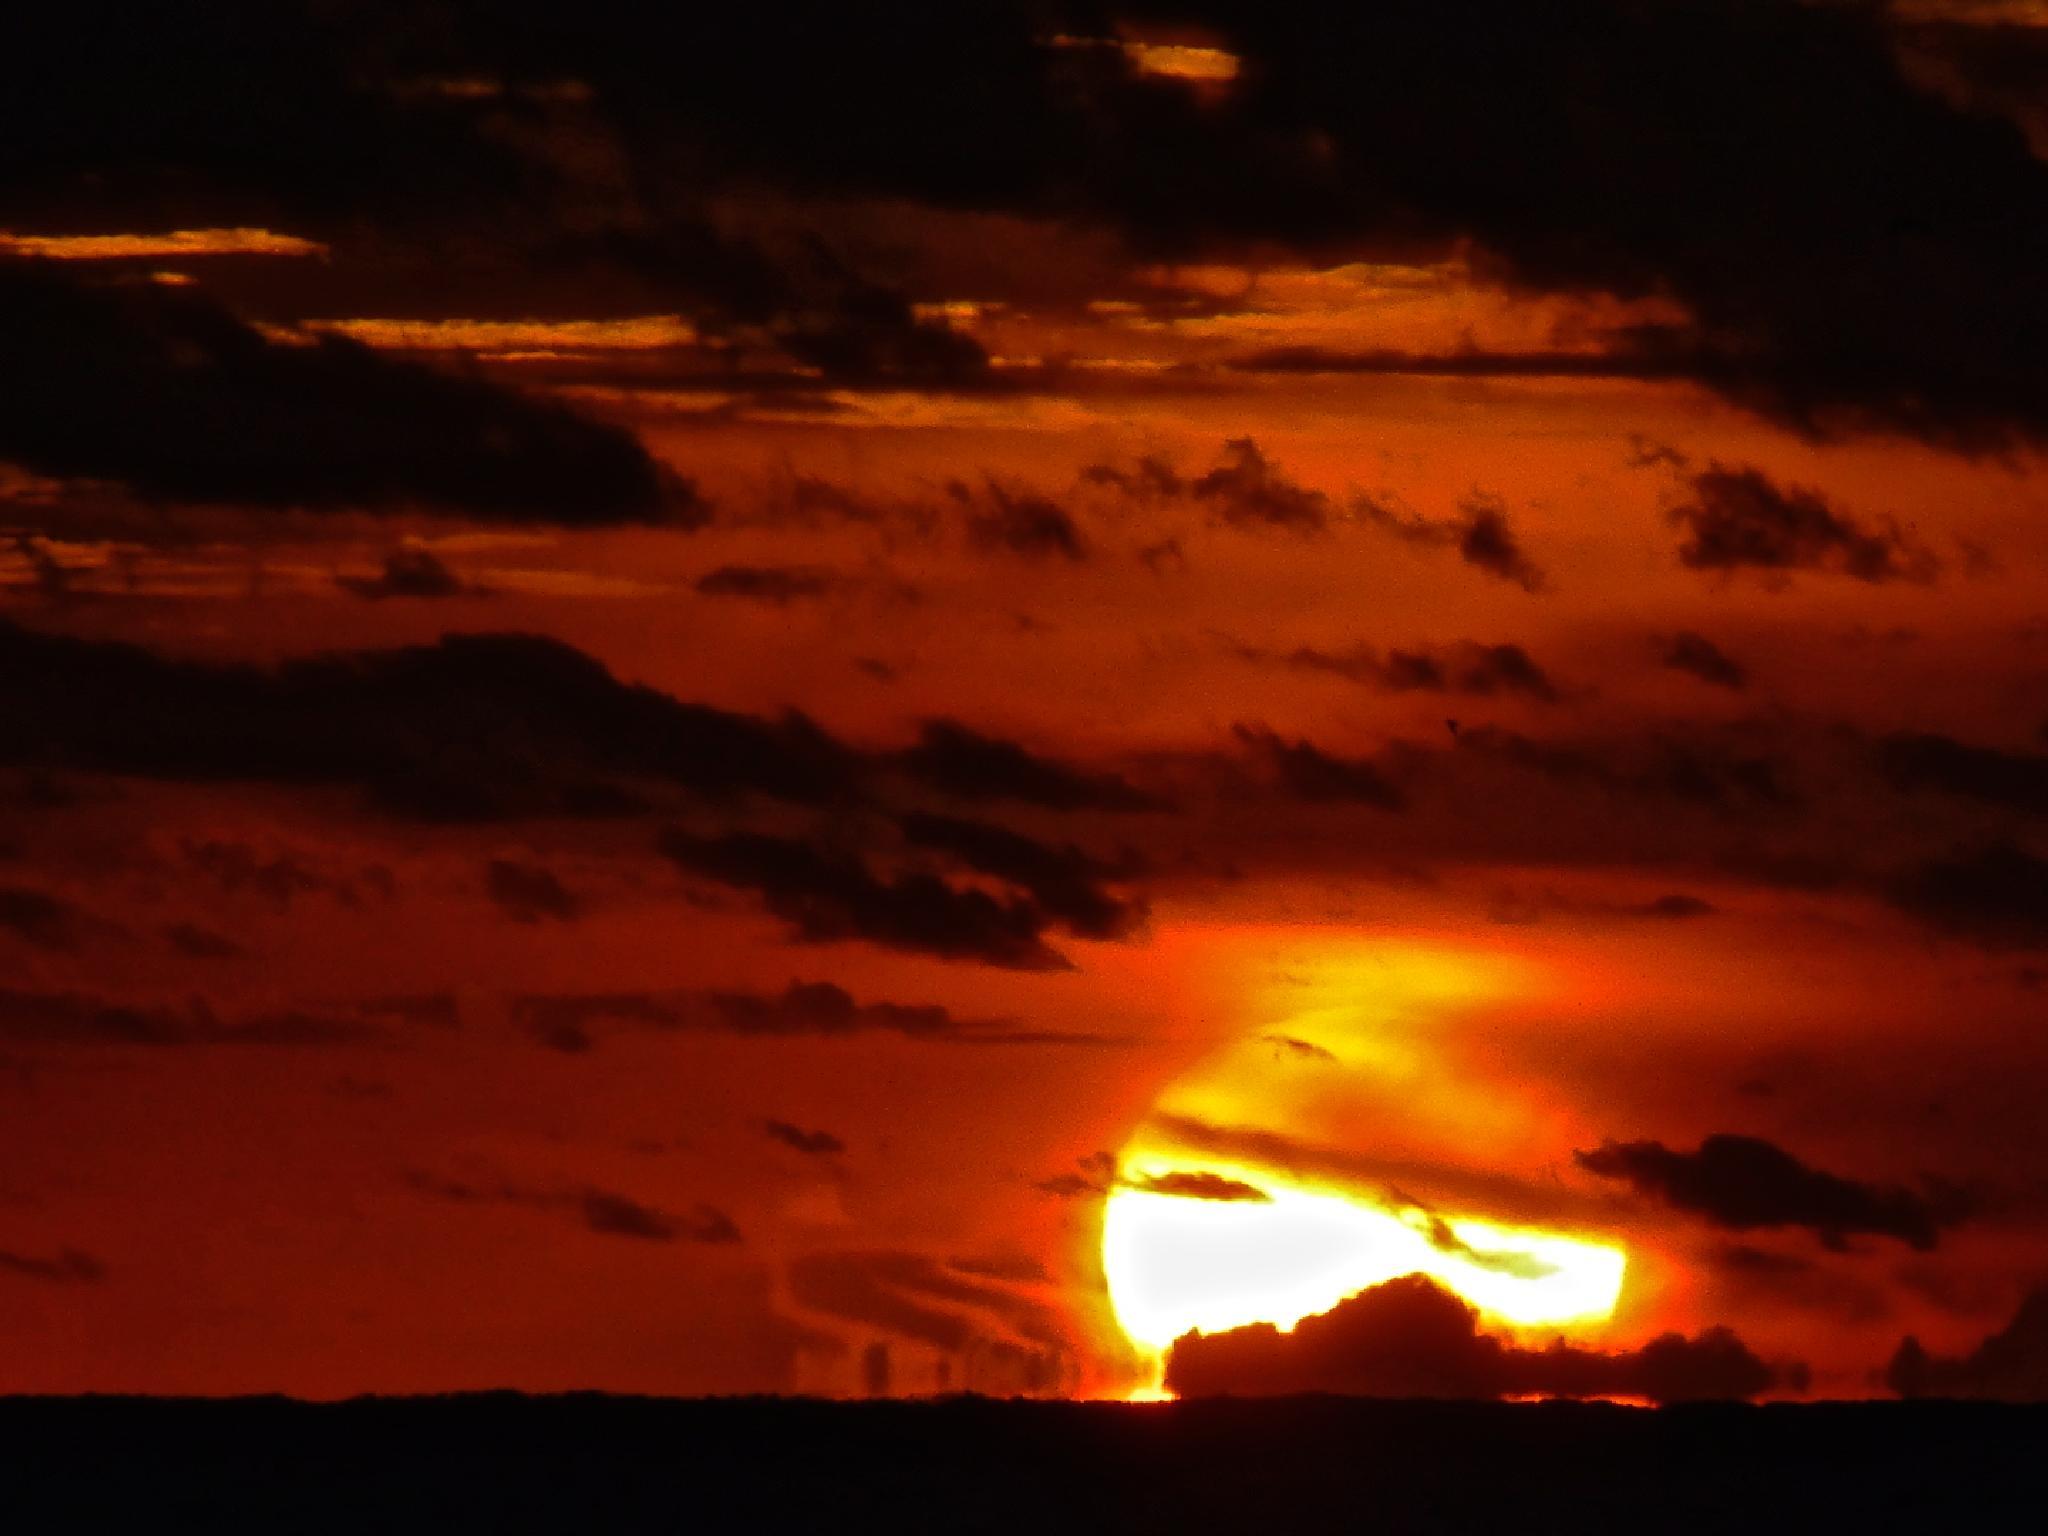 Carolina Sunrise by Hunter Ten Broeck